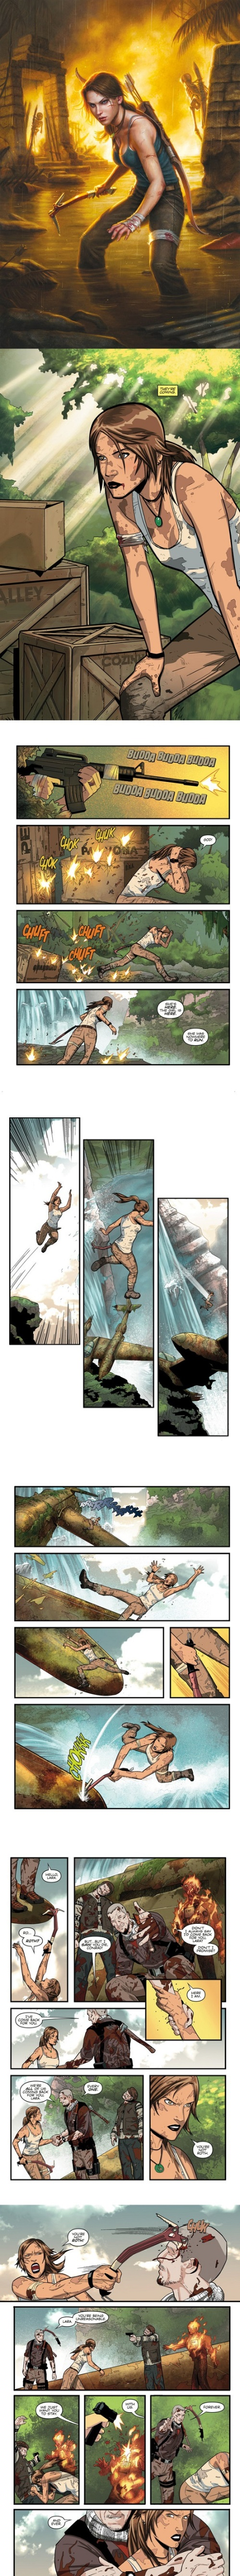 tomb-raider-1-dark-horse-comics (1)